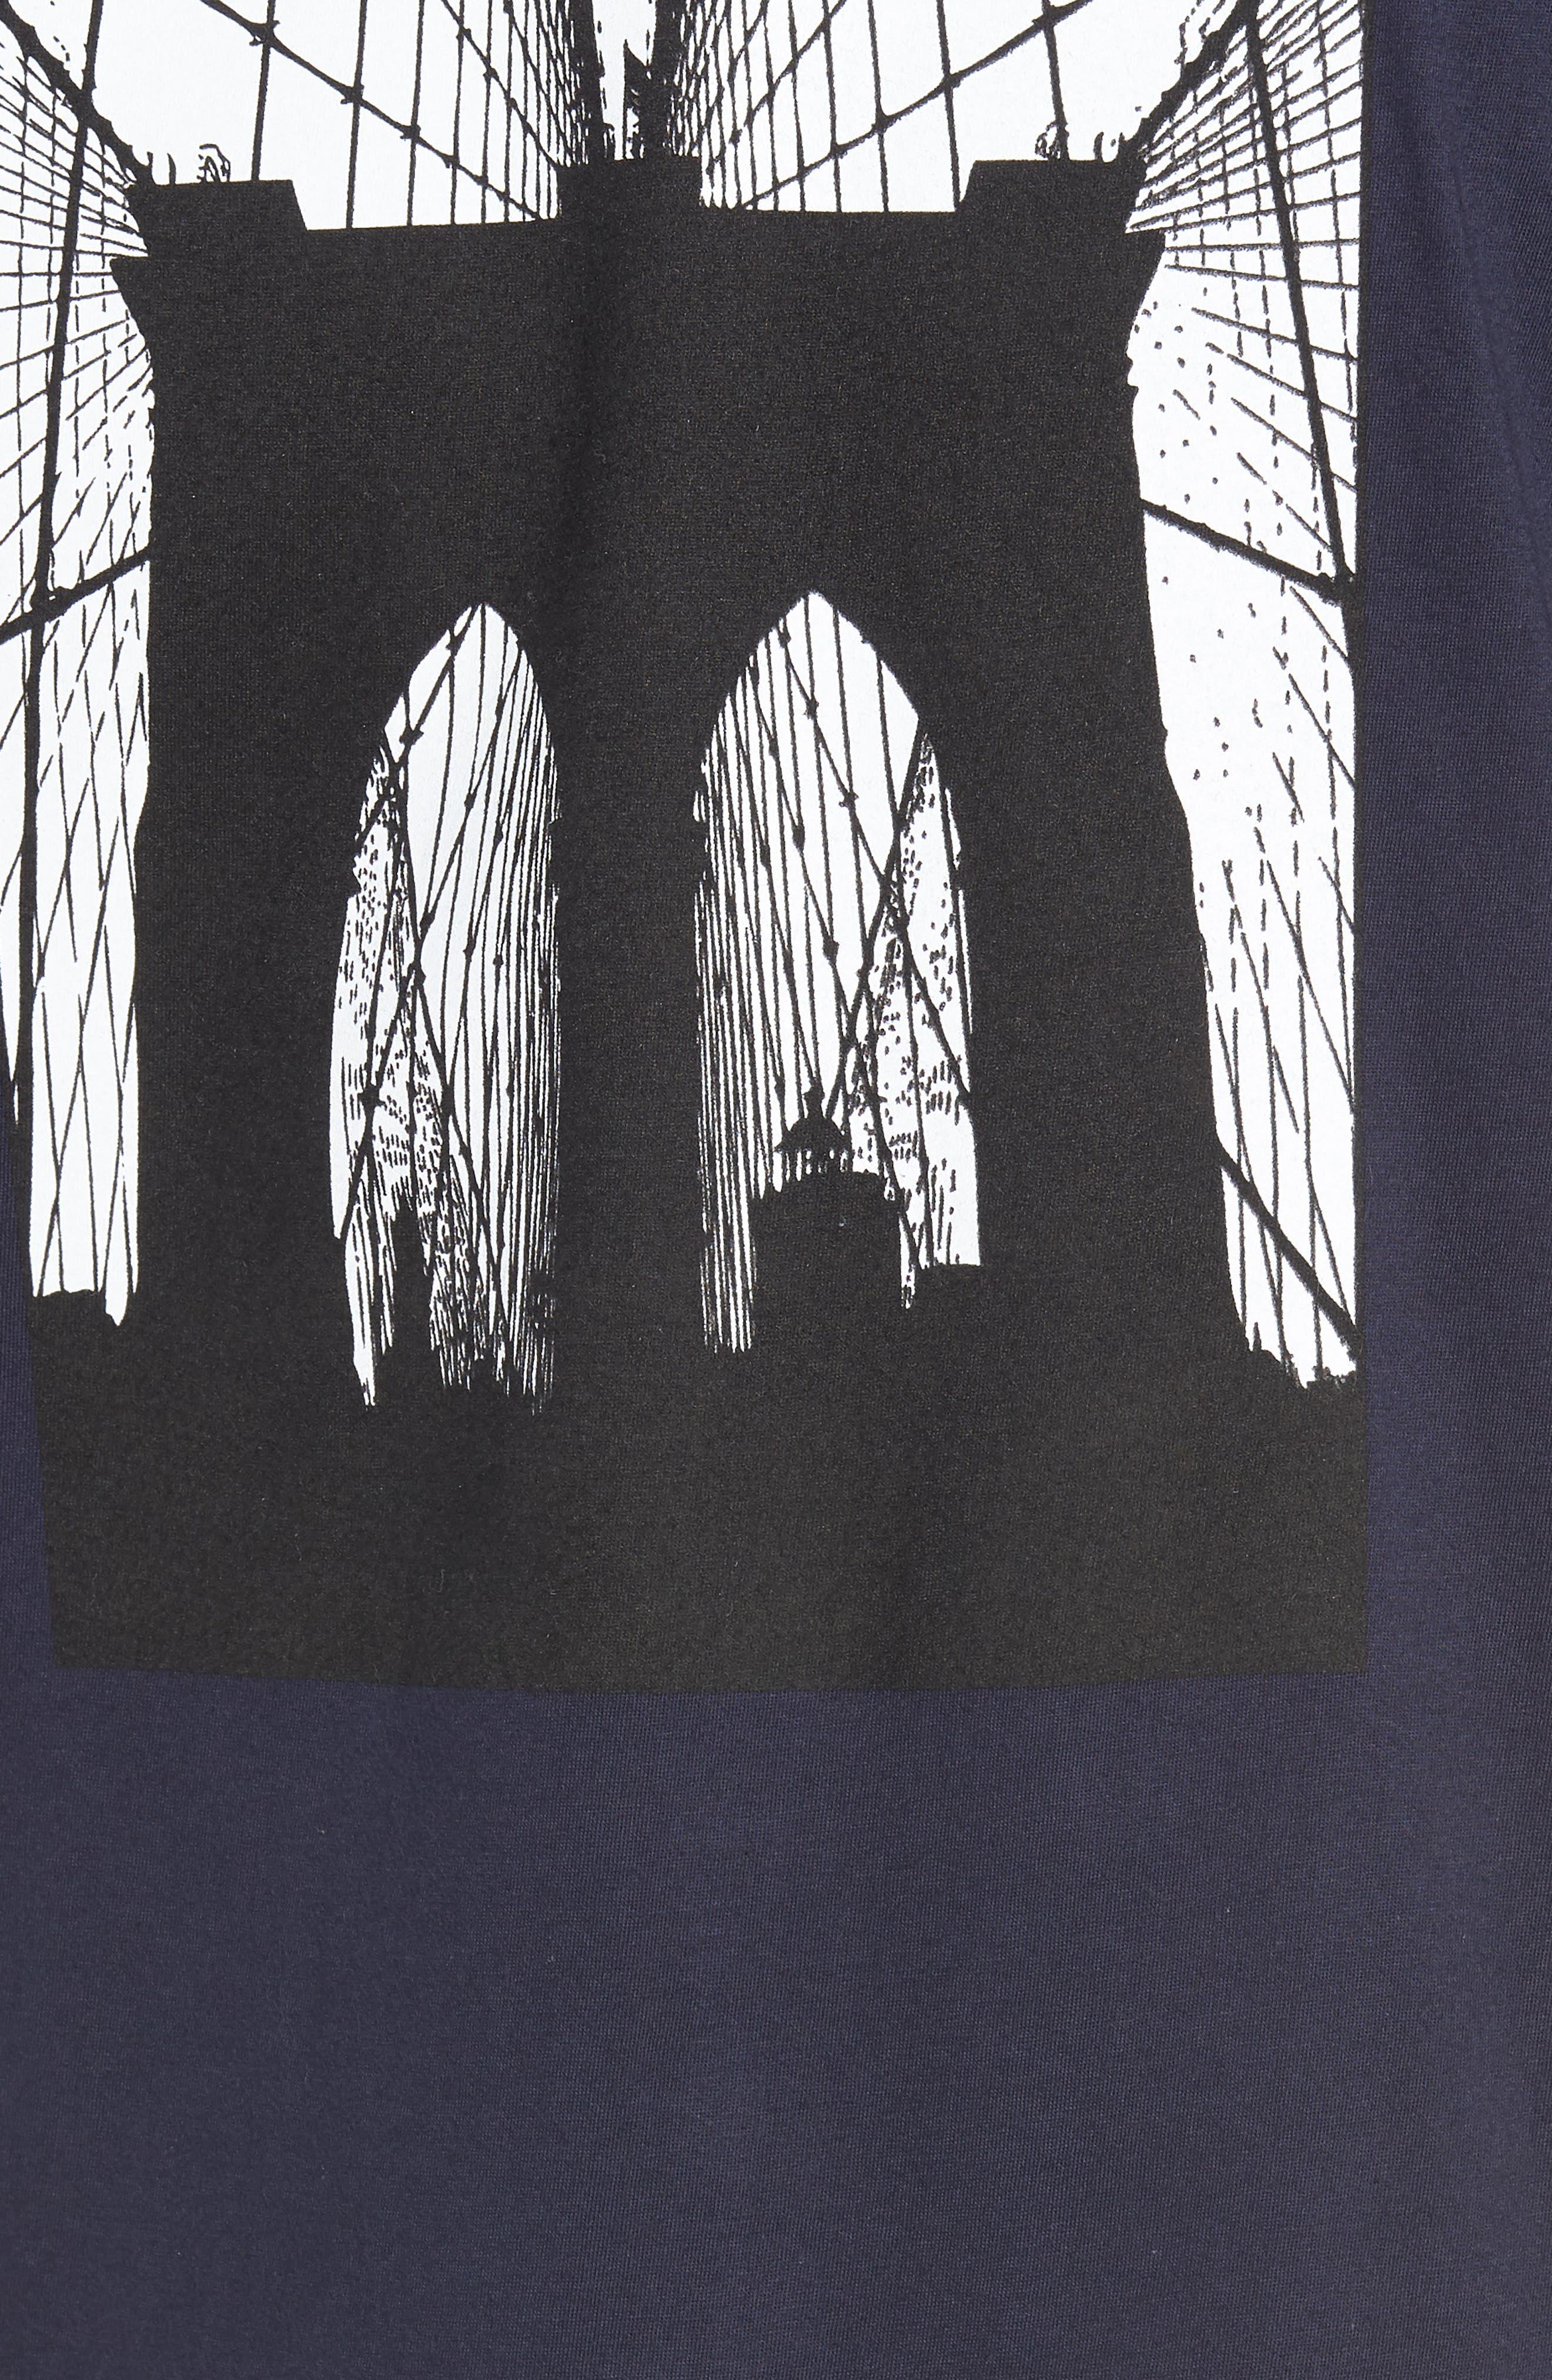 Brooklyn Bridge Graphic T-Shirt,                             Alternate thumbnail 5, color,                             Navy